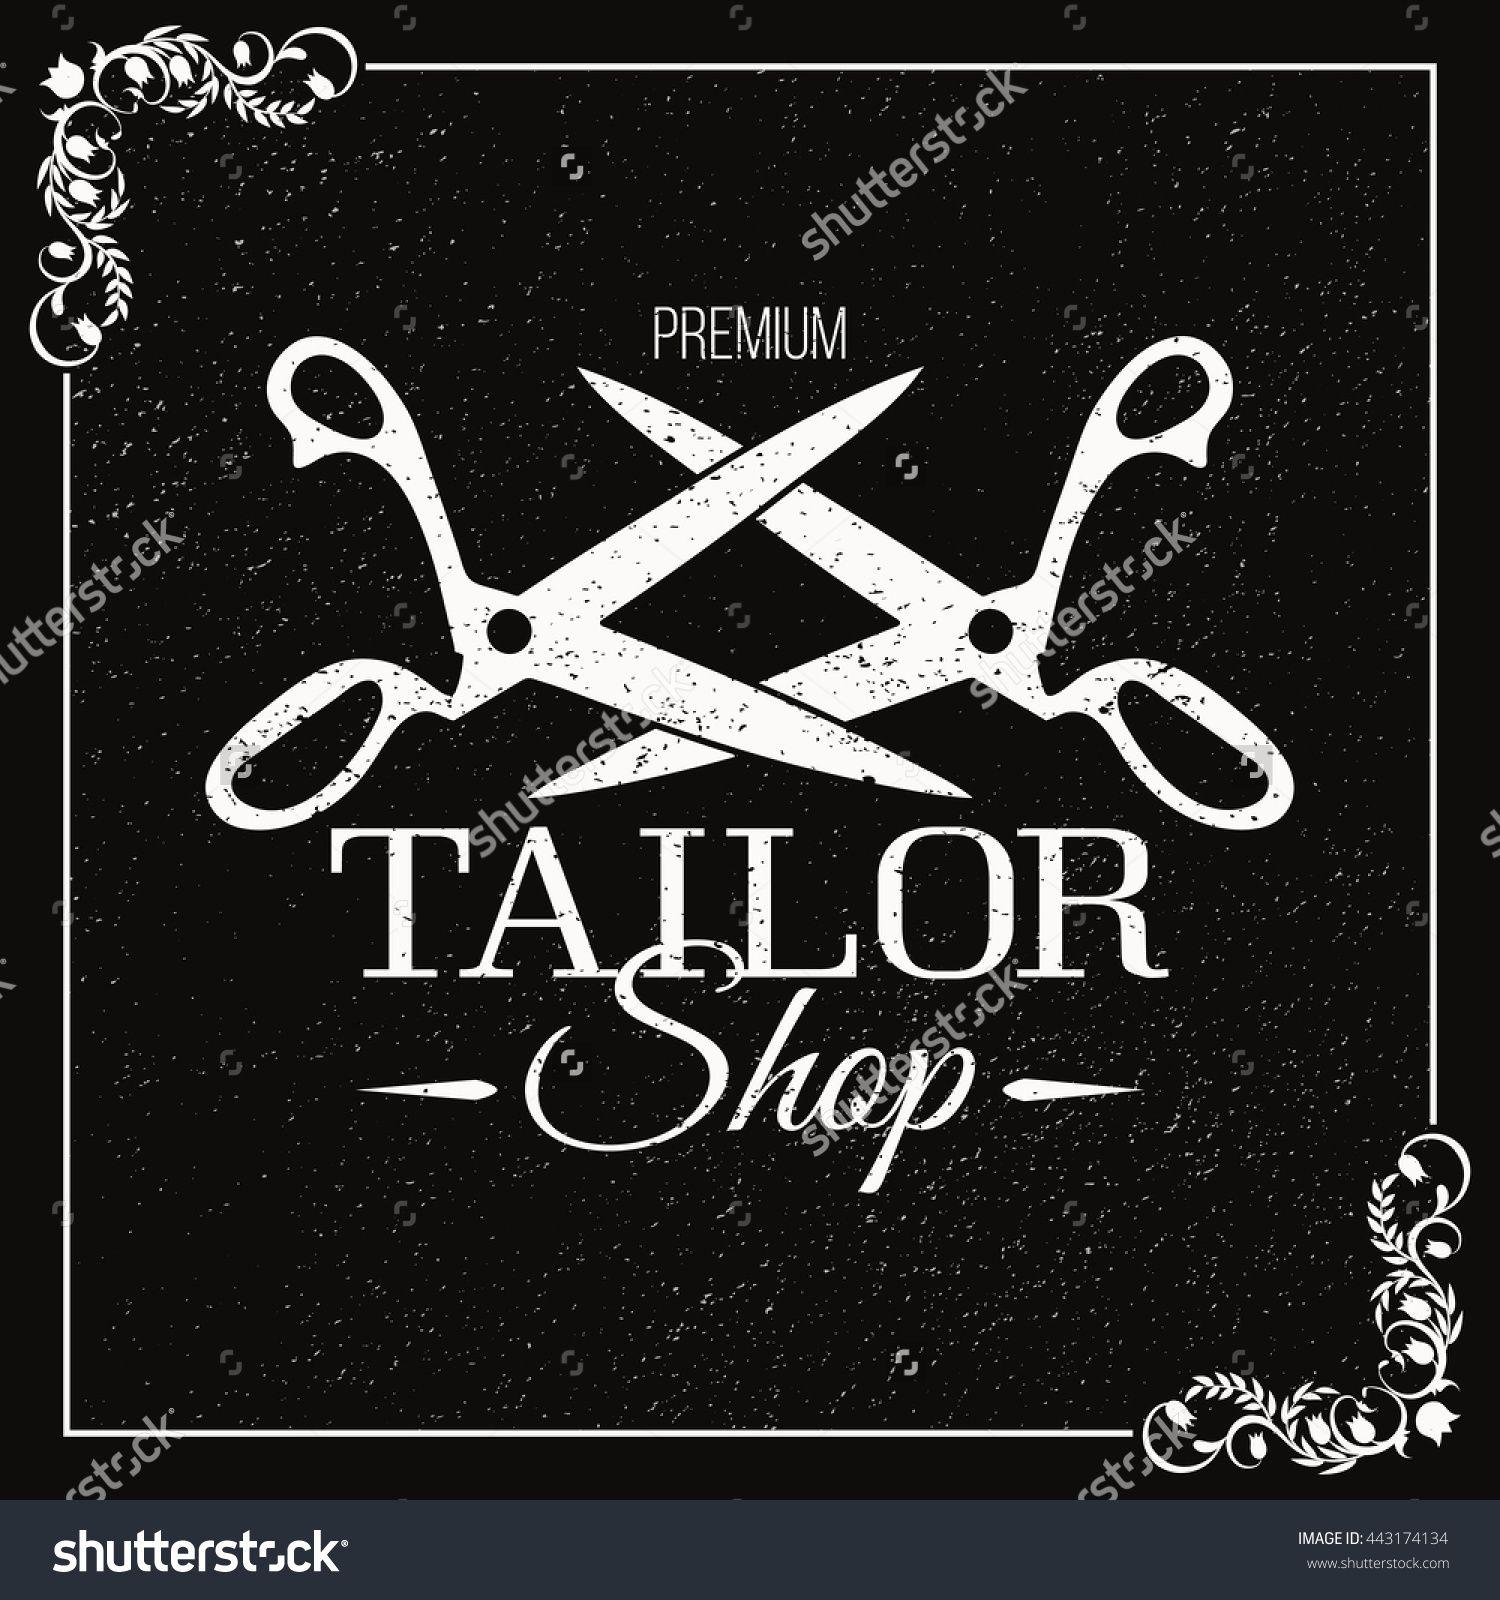 Dressmaker Scissors Banner. Chalk Board. Black And White With A Grunge Texture. Sewing Accessories. Tailor Shop. Стоковая векторная иллюстрация 443174134 : Shutterstock